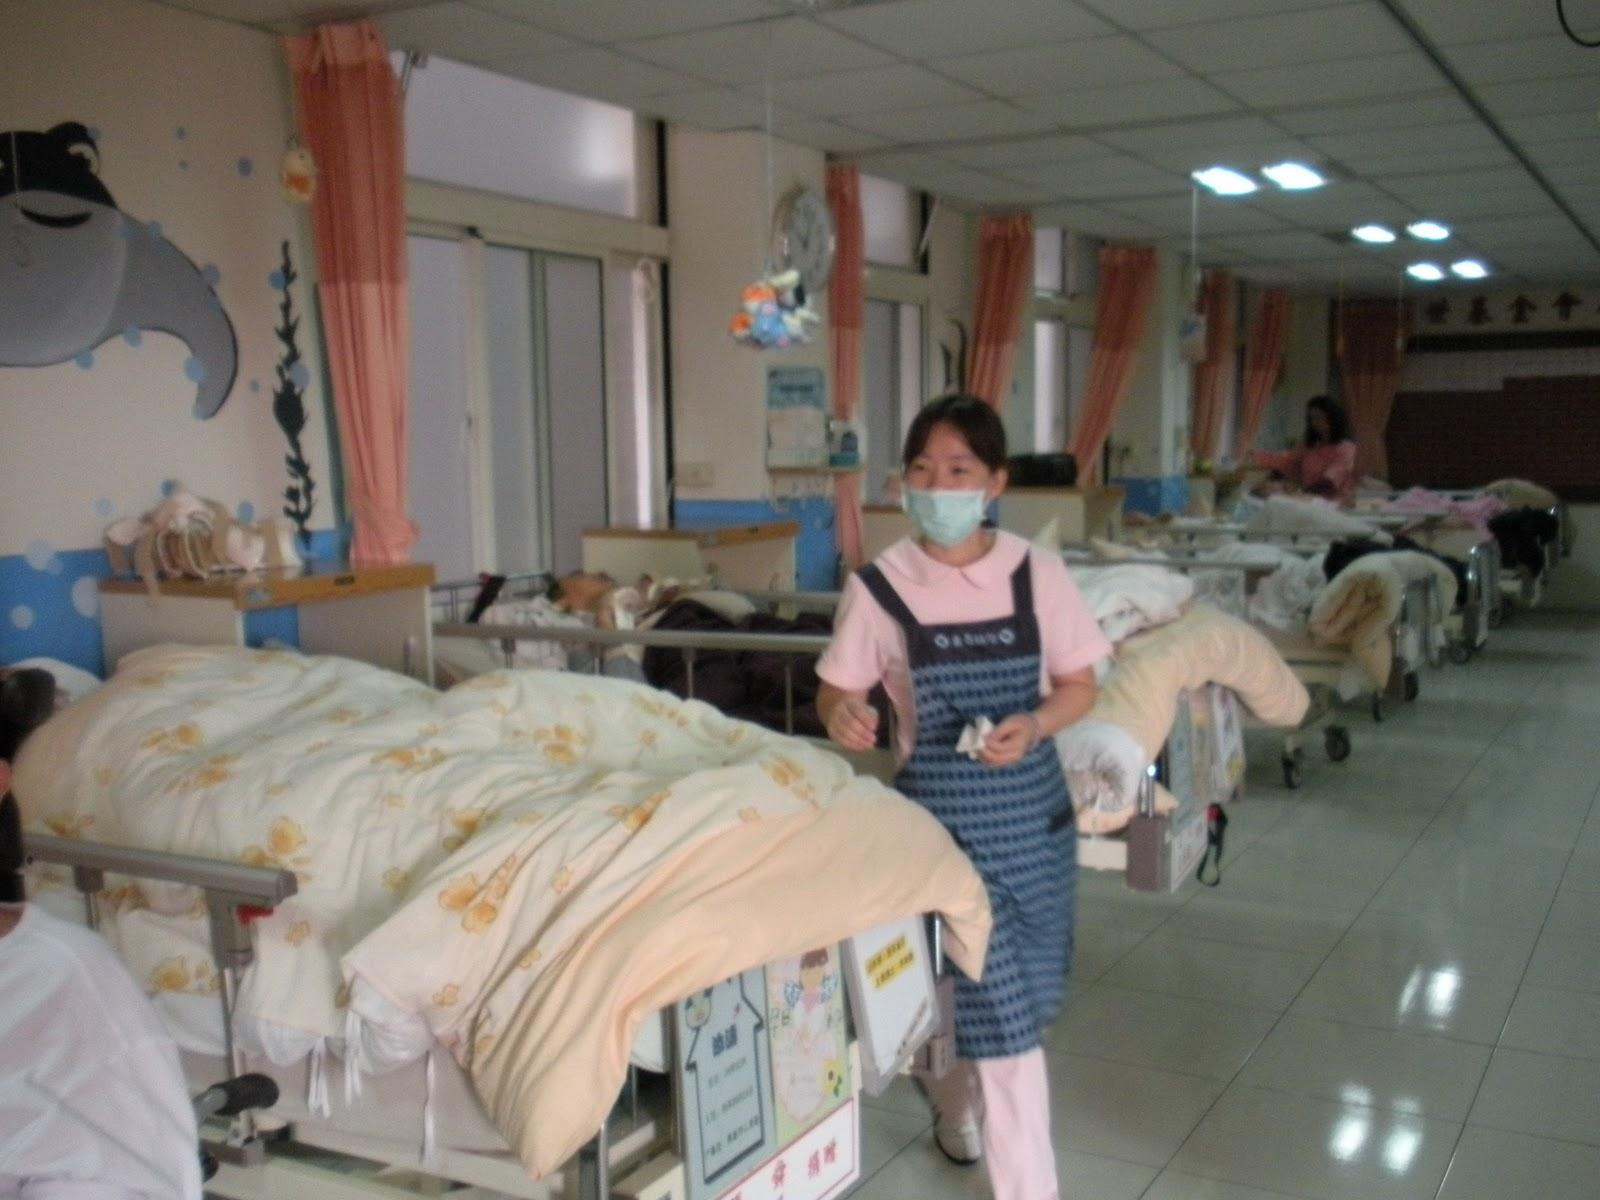 Gaymont Nursing Home